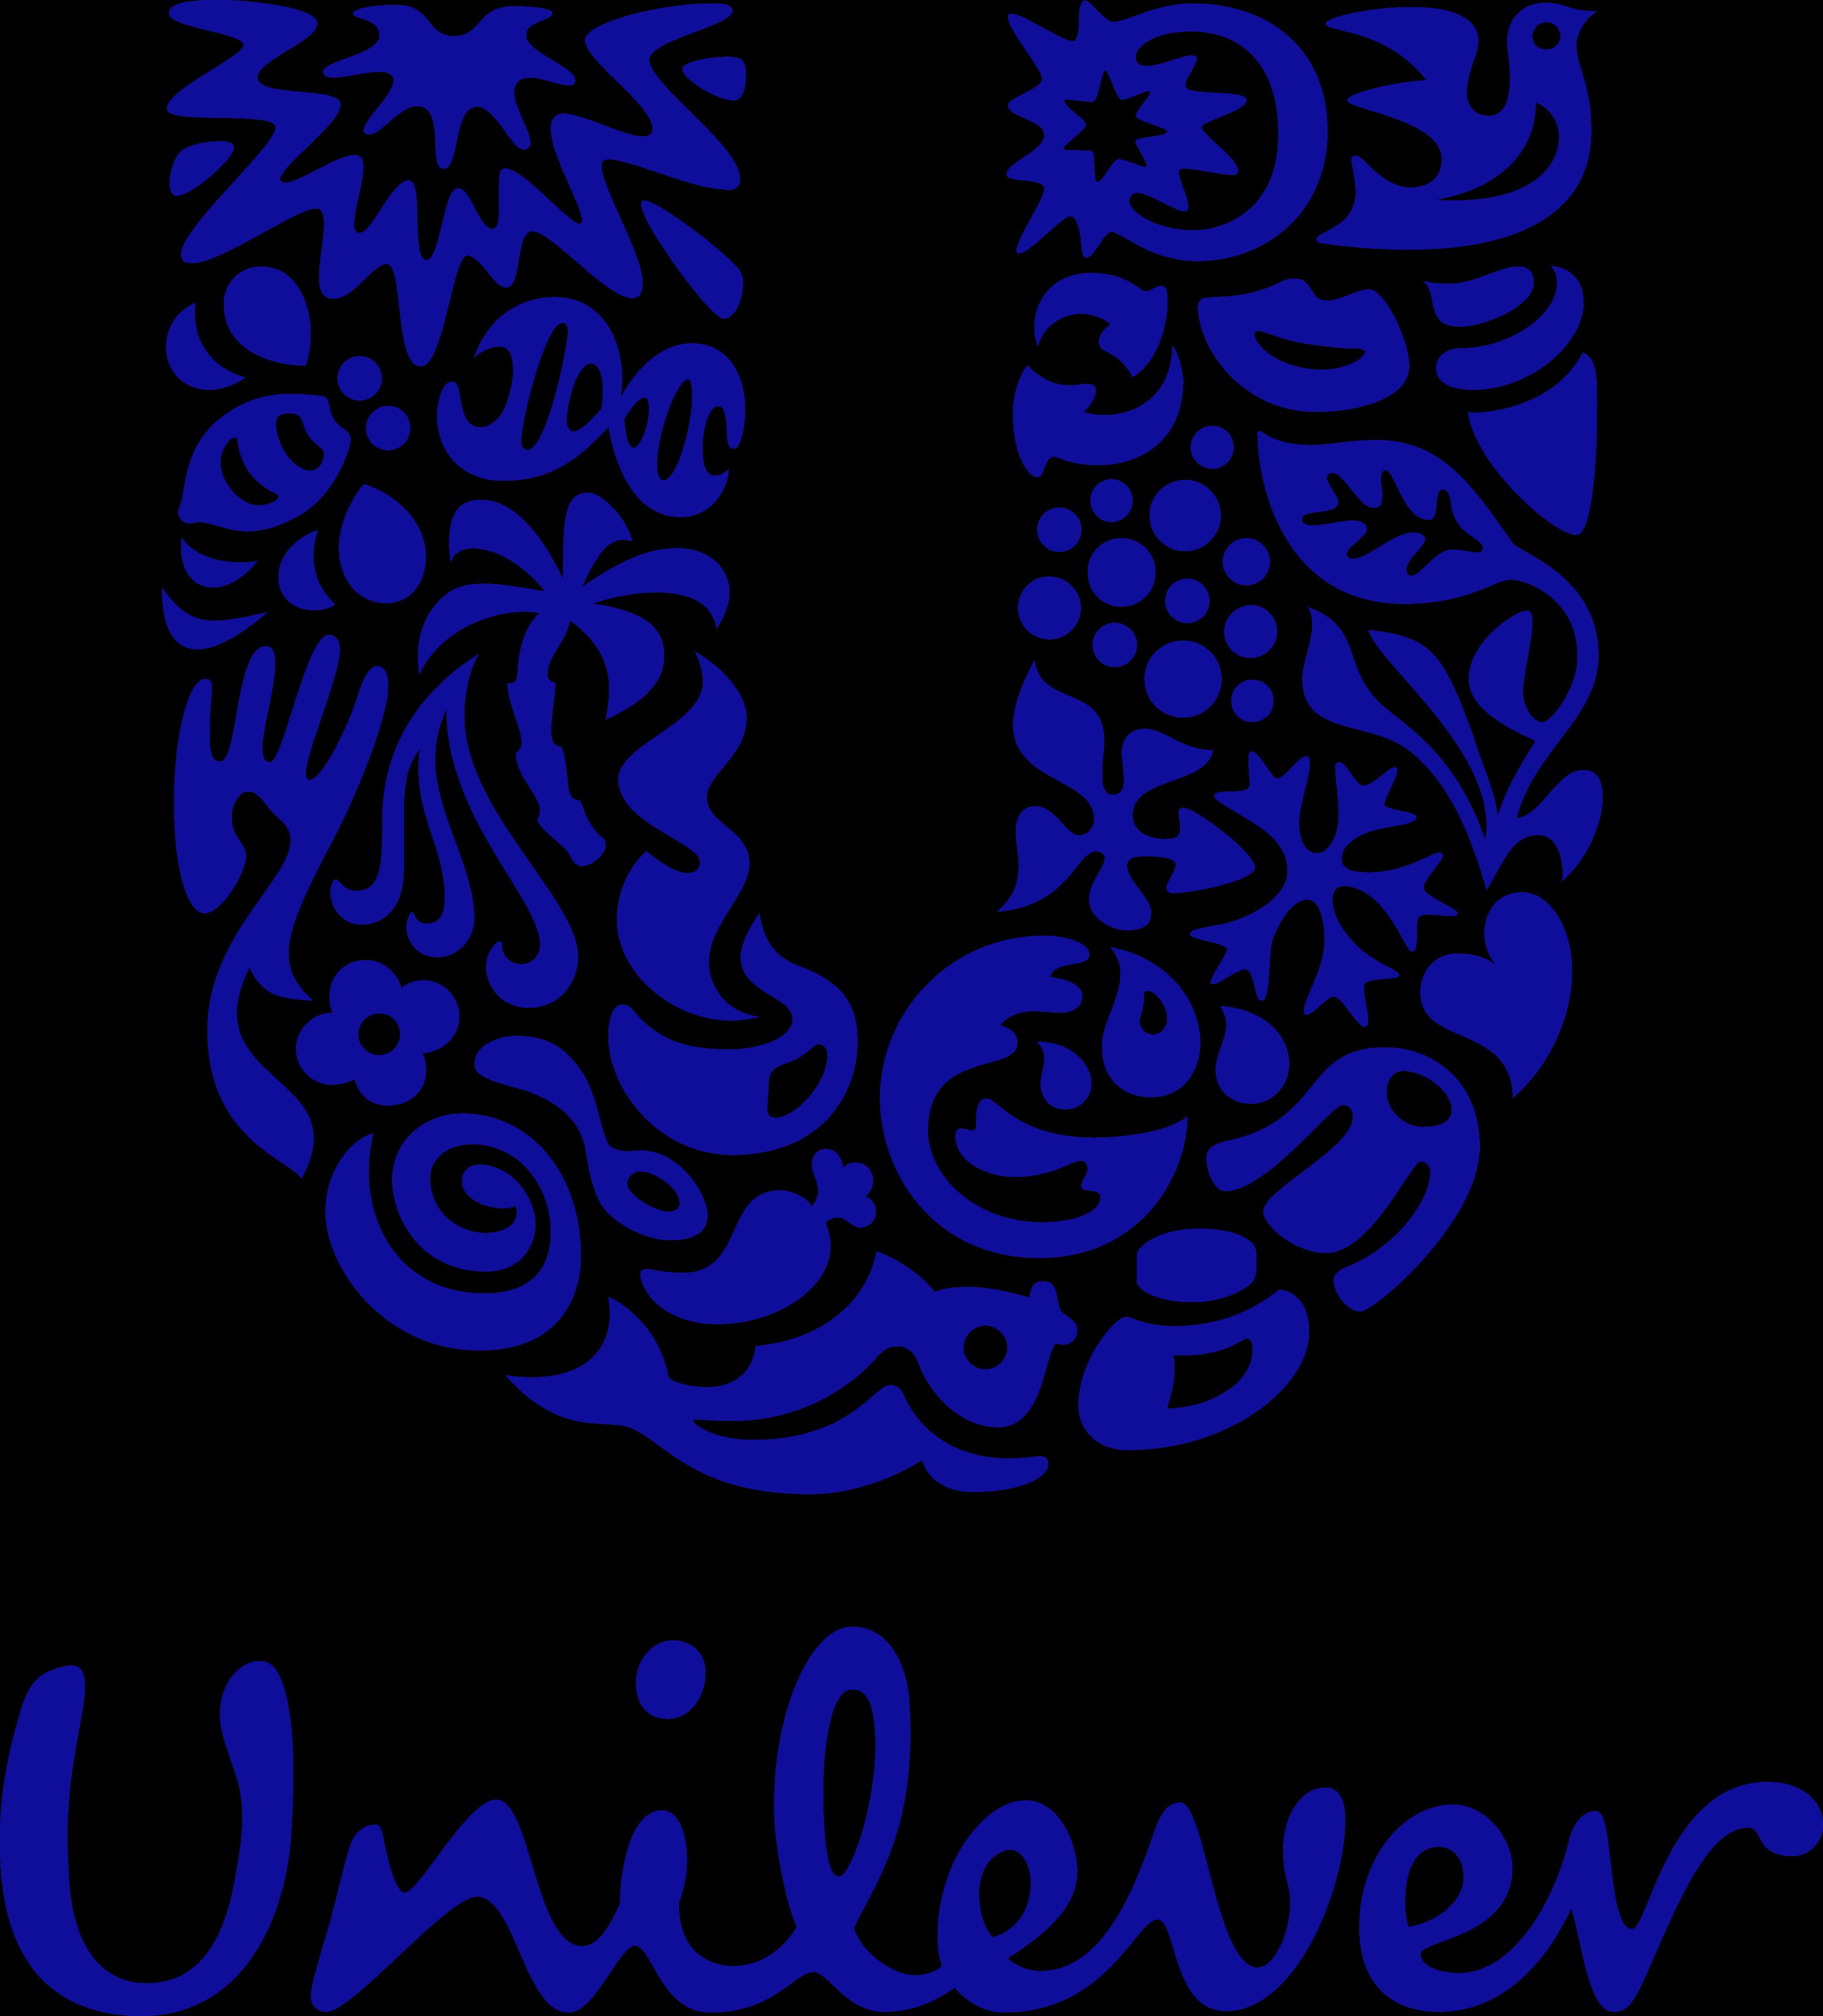 unilever logo 1 - Unilever Logo